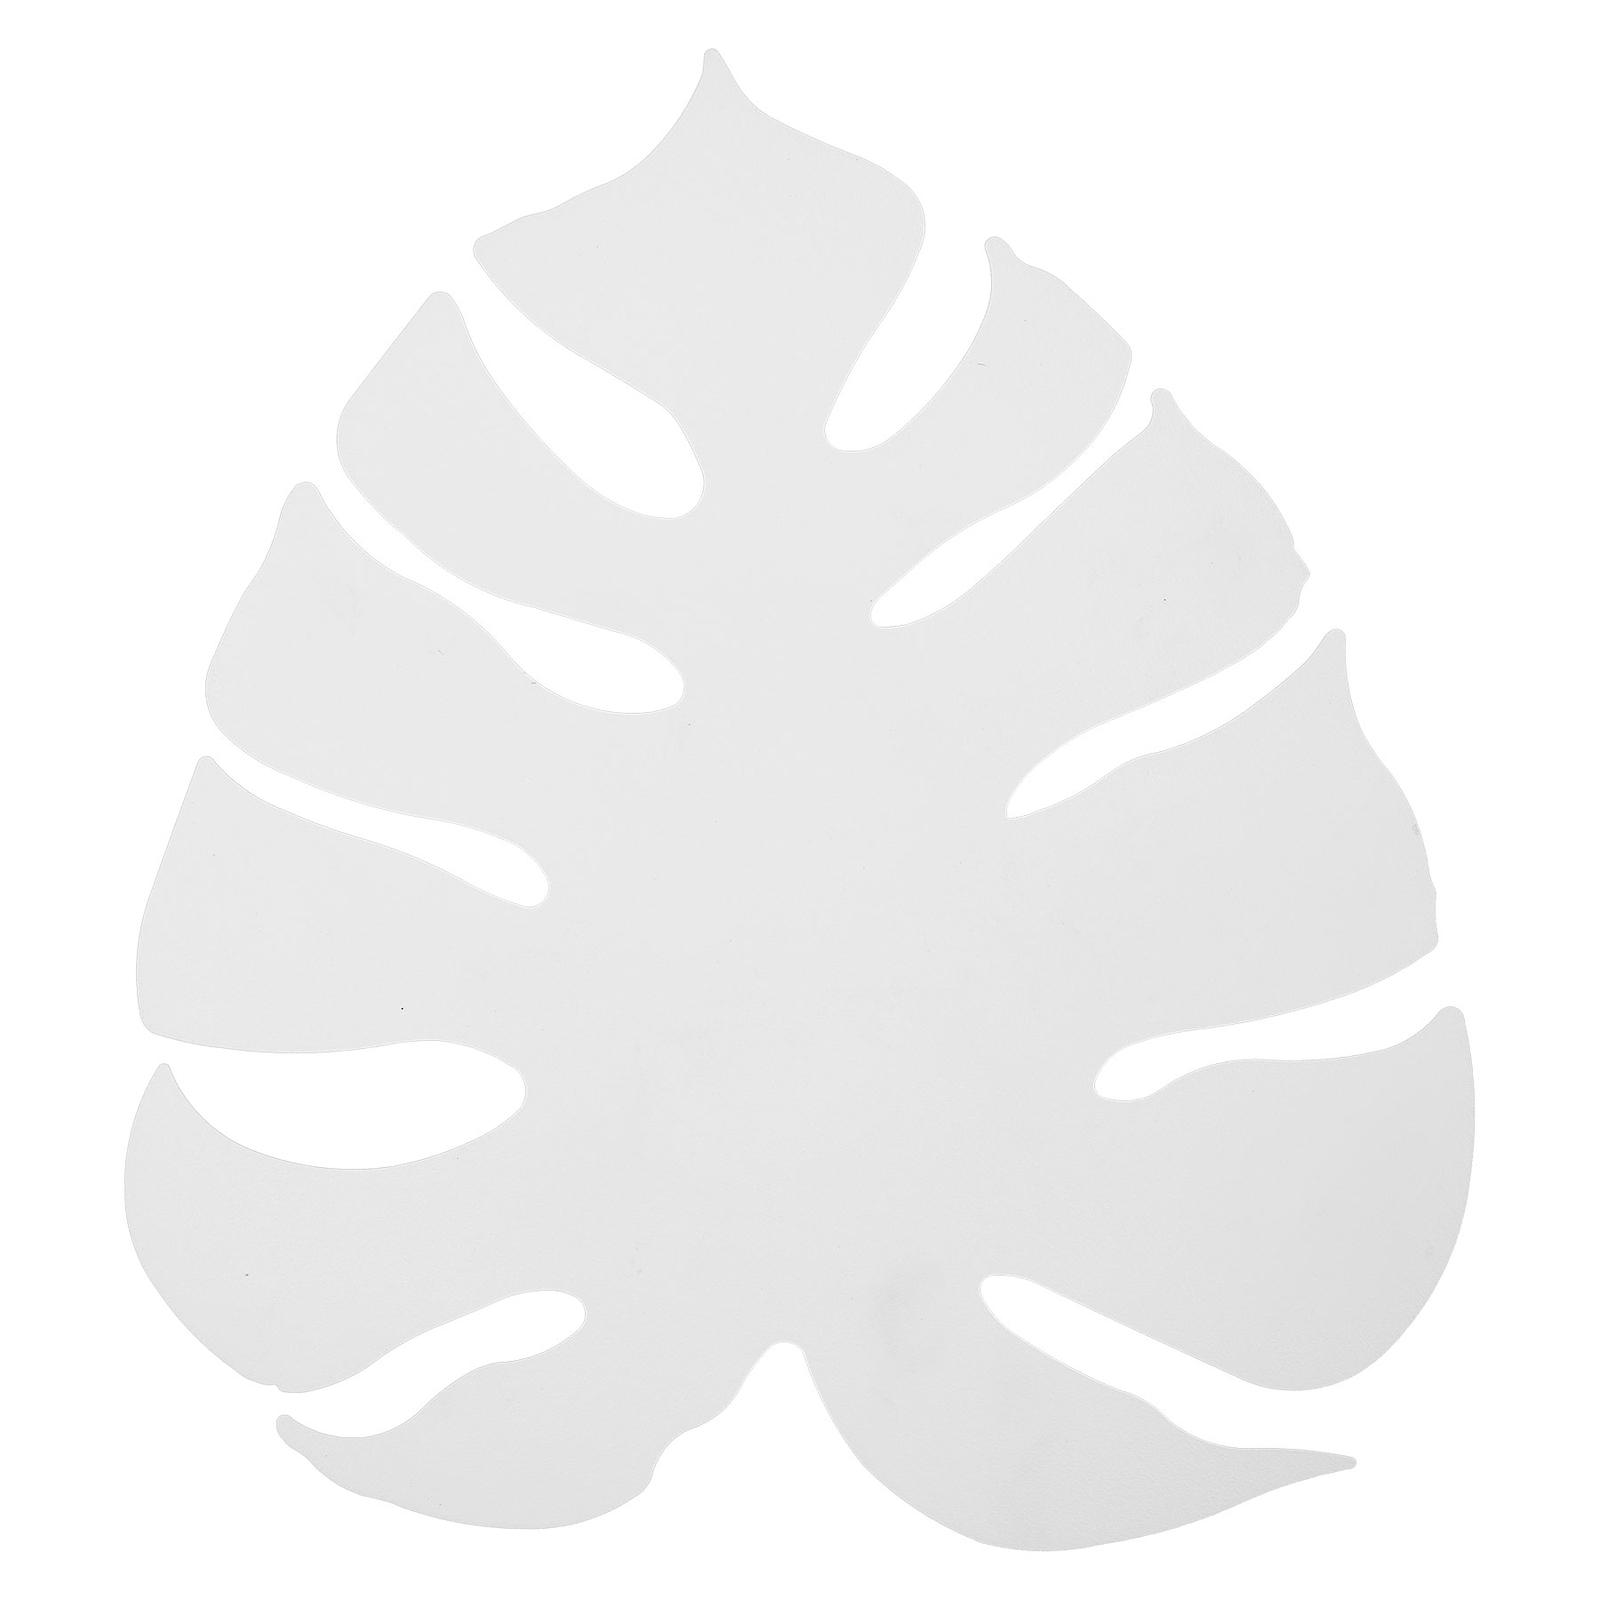 Kinkiet LED Monstera jako liść, biały